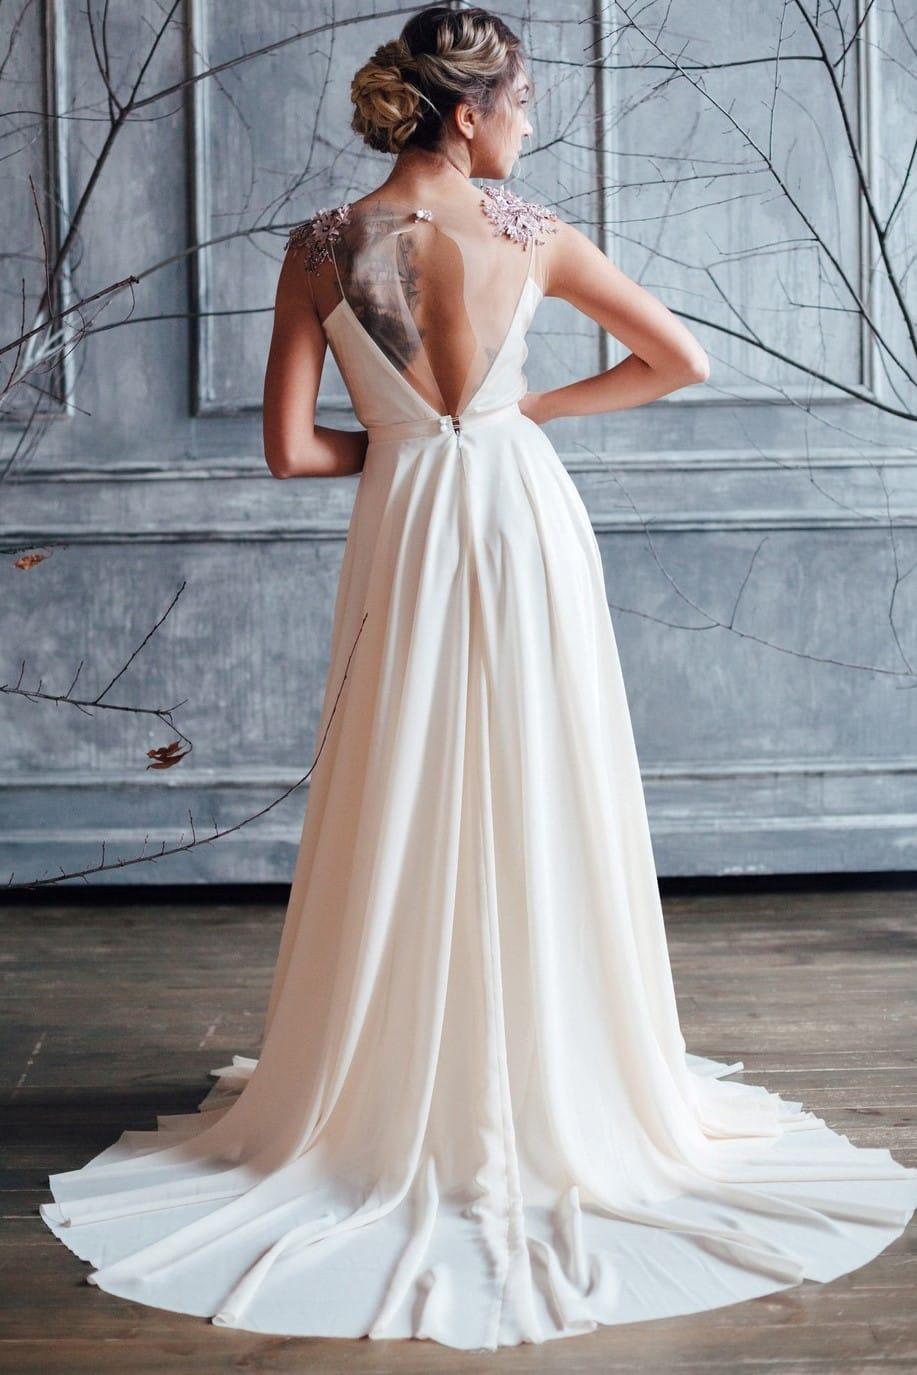 Вечернее платье ZION, коллекция FLOWER MAGIC, бренд RARE BRIDAL, фото 4